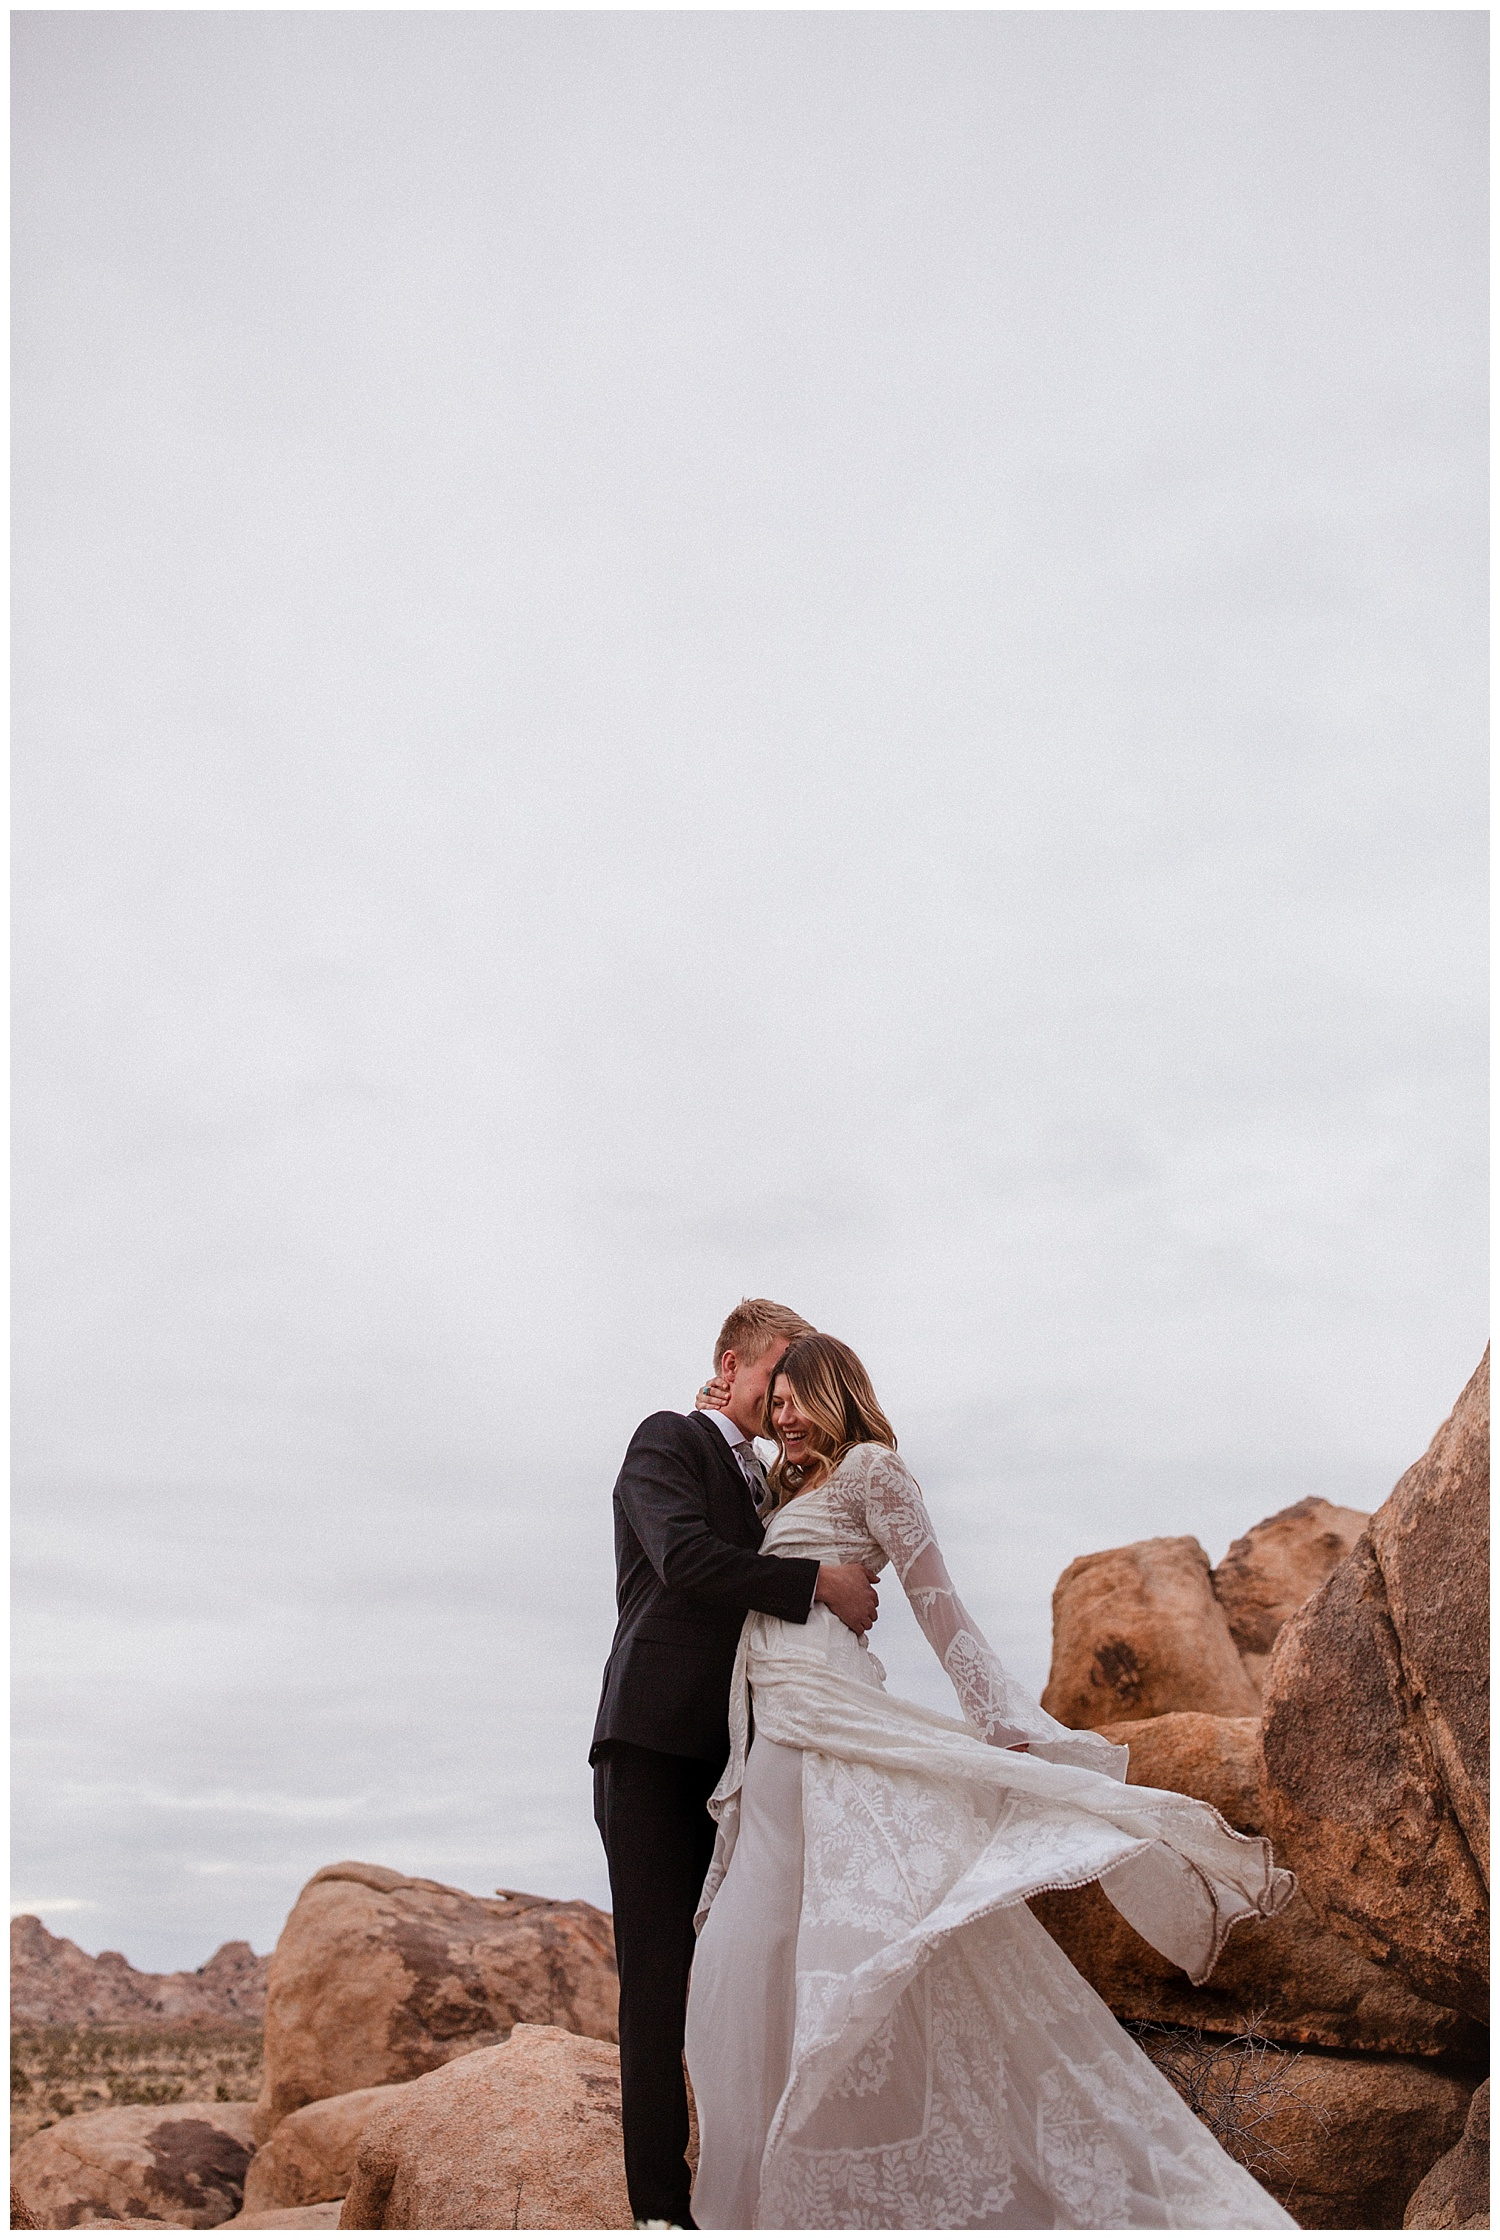 romantic_elopement_joshua_tree_adventurous_wedding_photographer_romantic_intimate_wedding_0023.jpg